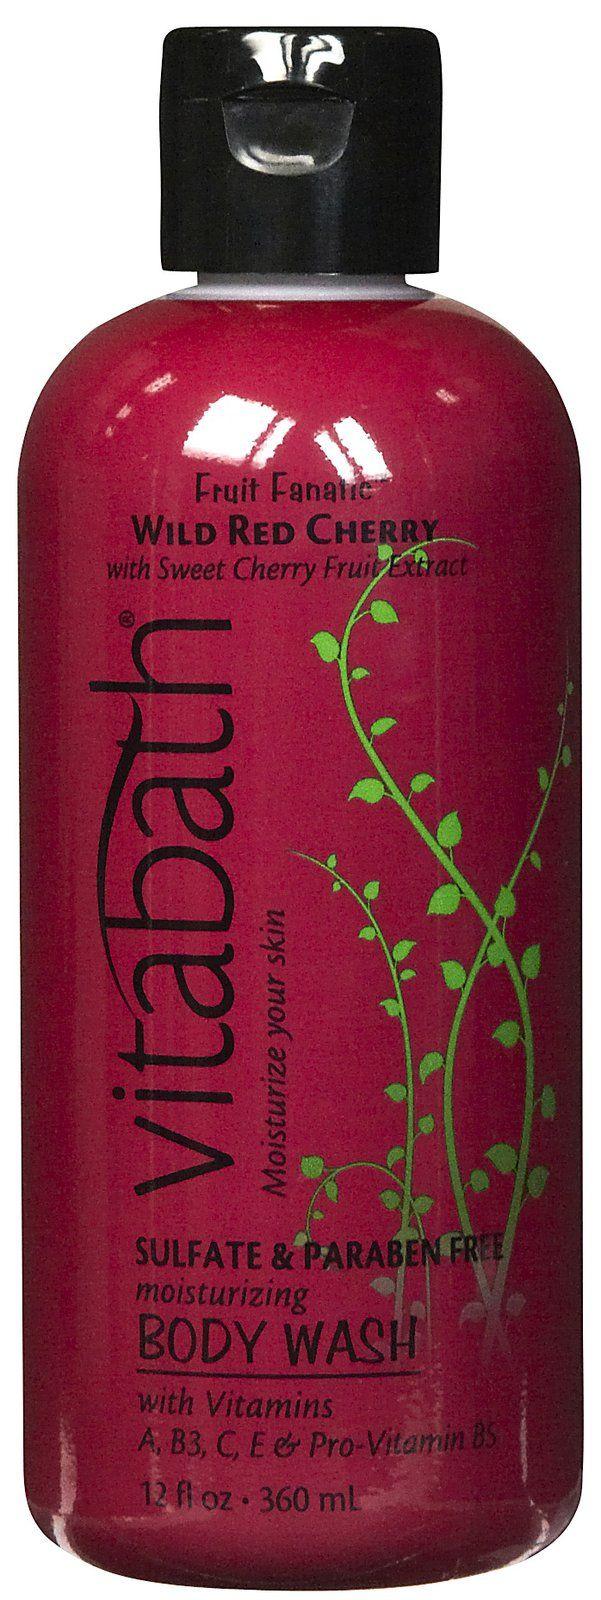 Vitabath Fruit Fanatic Collection Body Wash, Wild Red Cherry ...